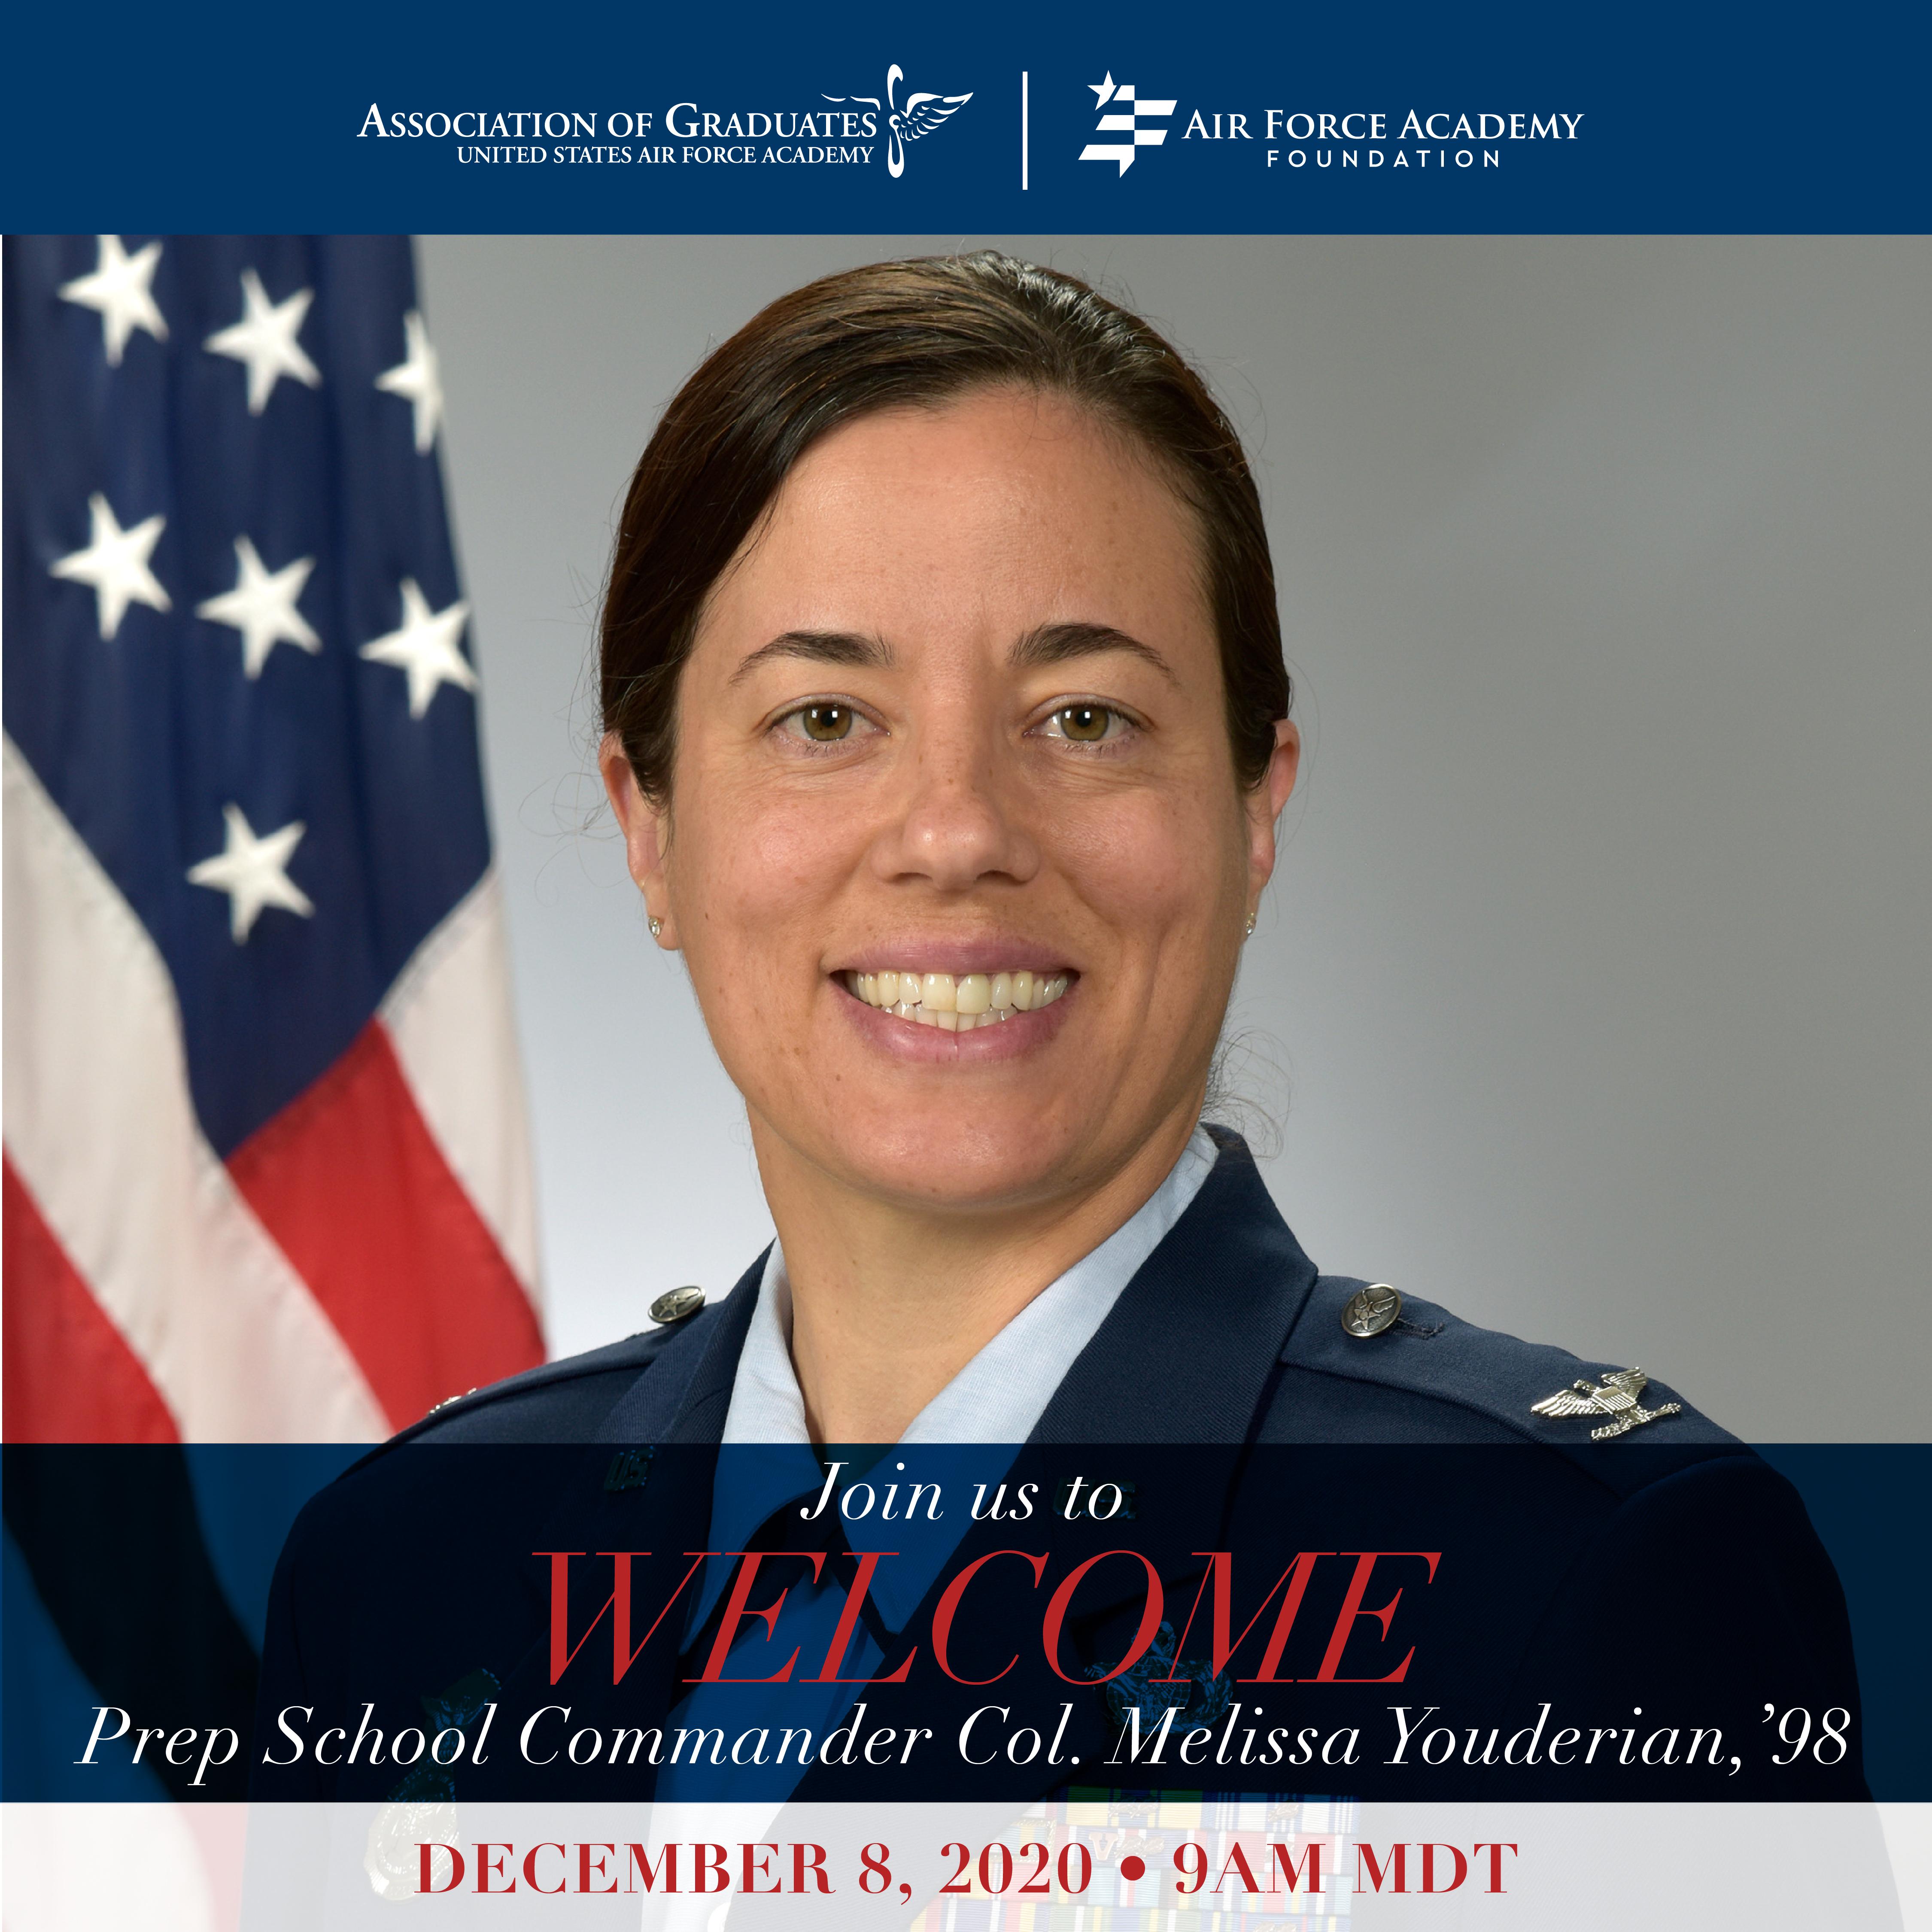 Image for Col Youderian, USAFA Prep School Commander Welcome Call webinar